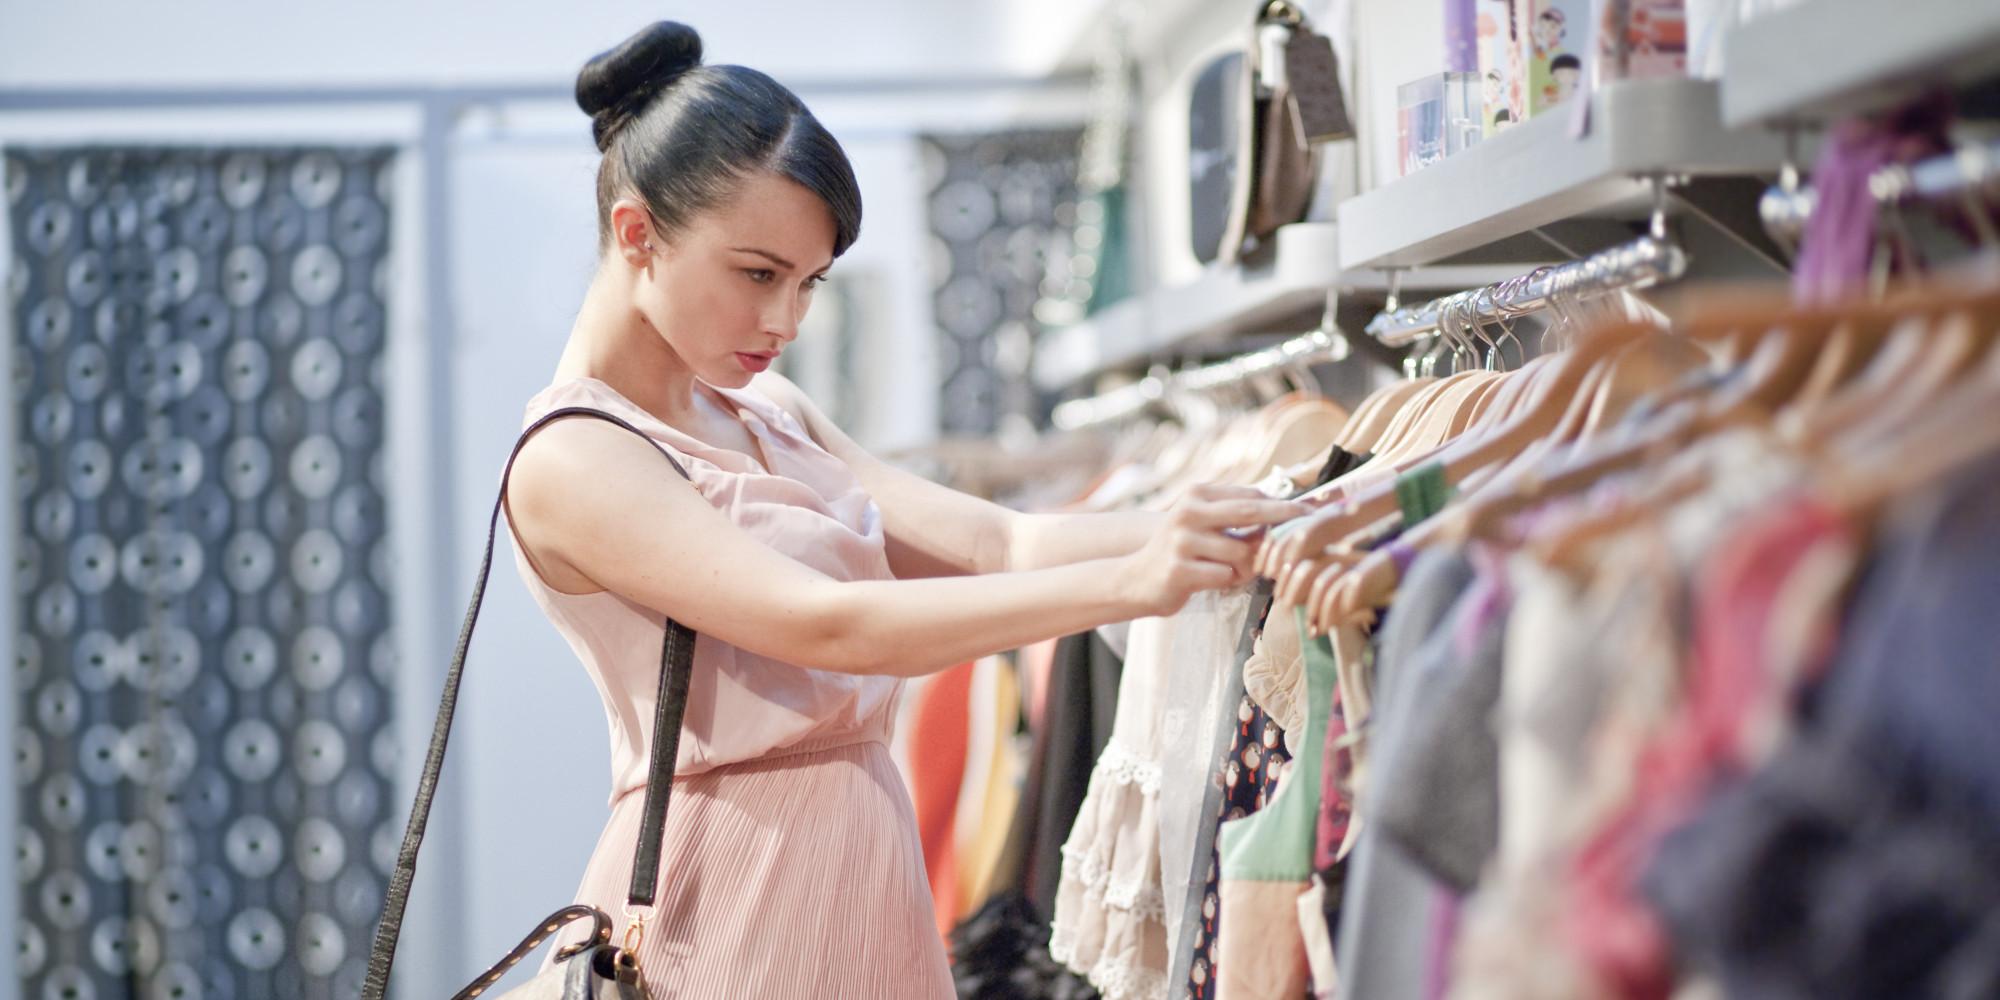 woman-shopping.jpg